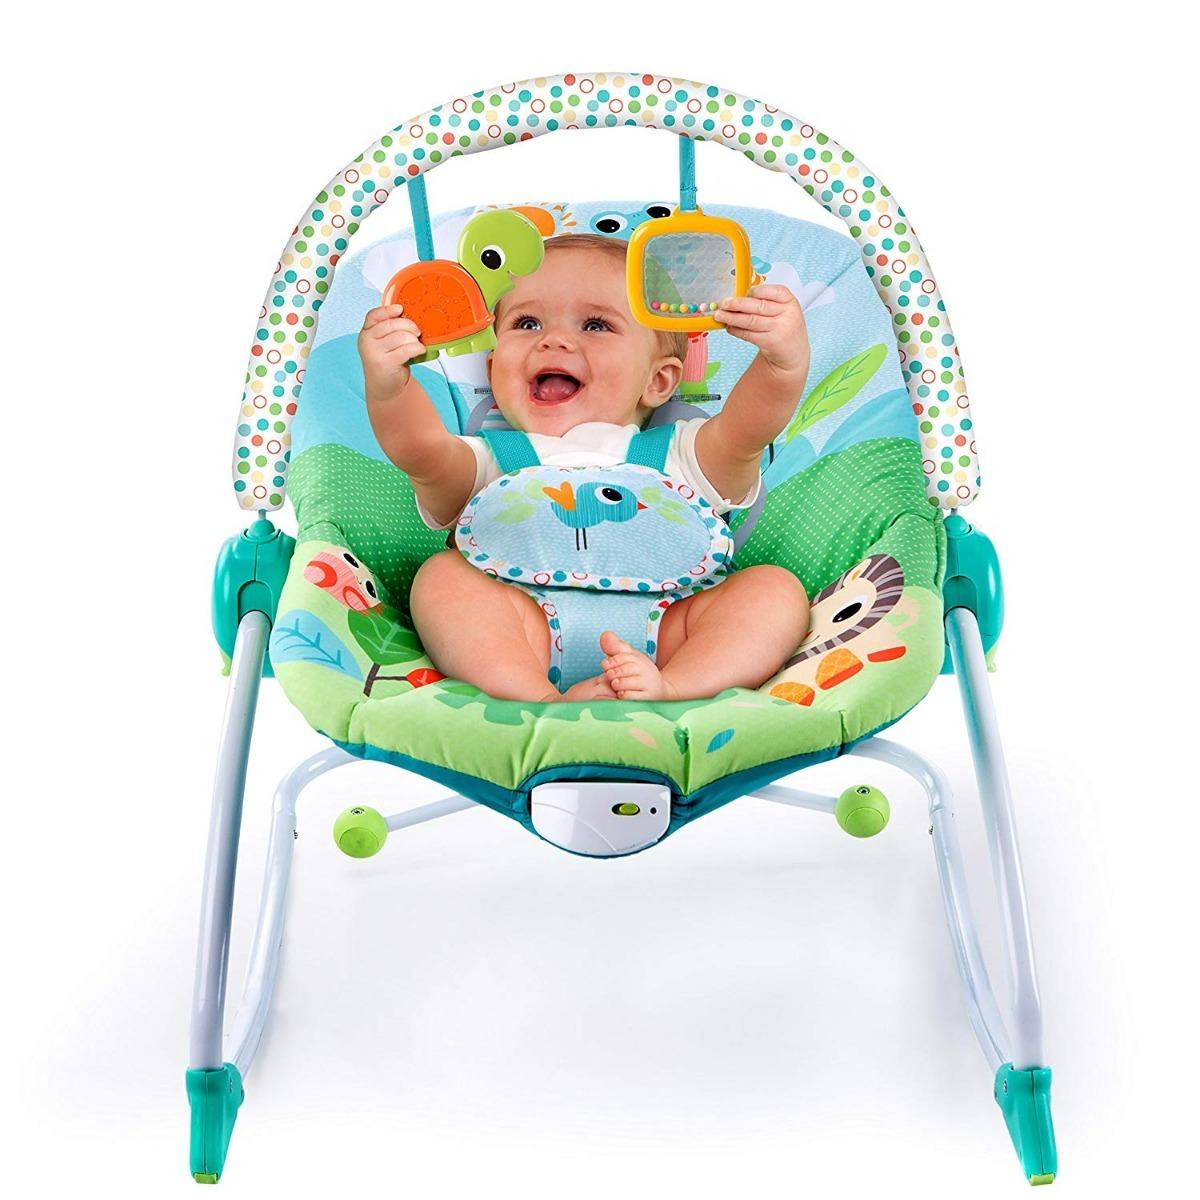 05b21b5b6 bouncer silla mecedora bebe bright starts playful vibradora. Cargando zoom.